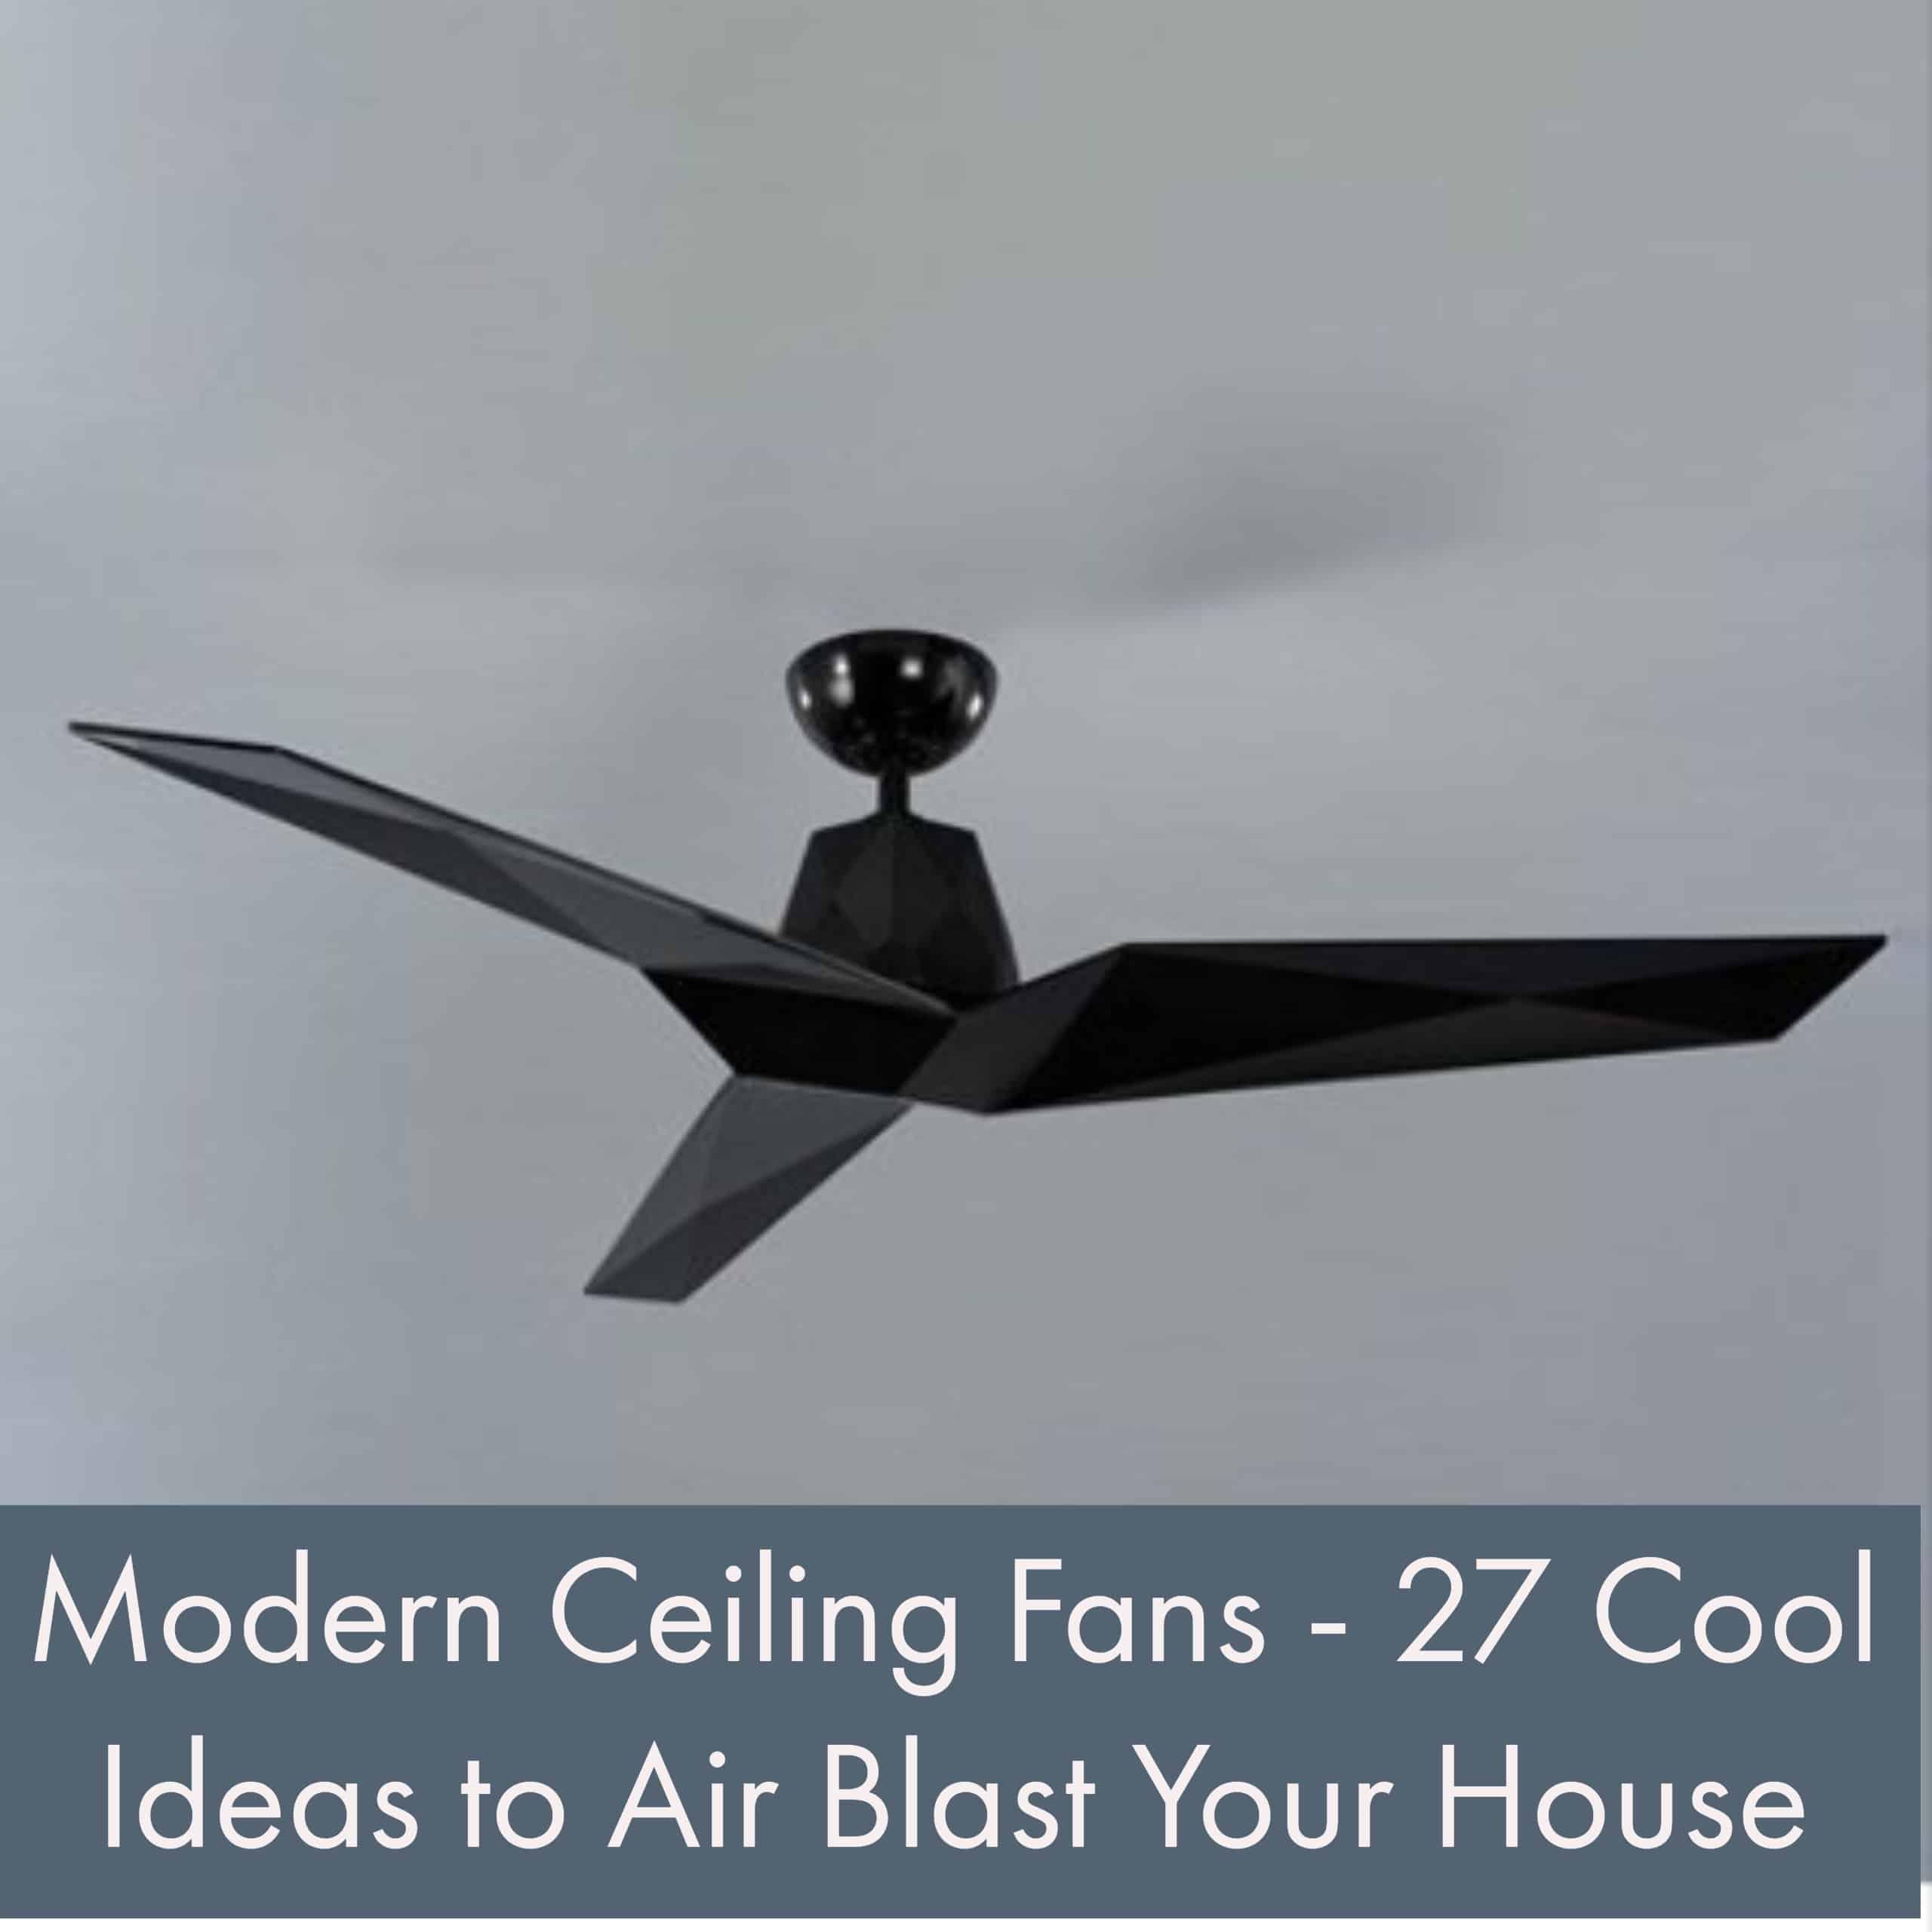 Modern Ceiling Fans